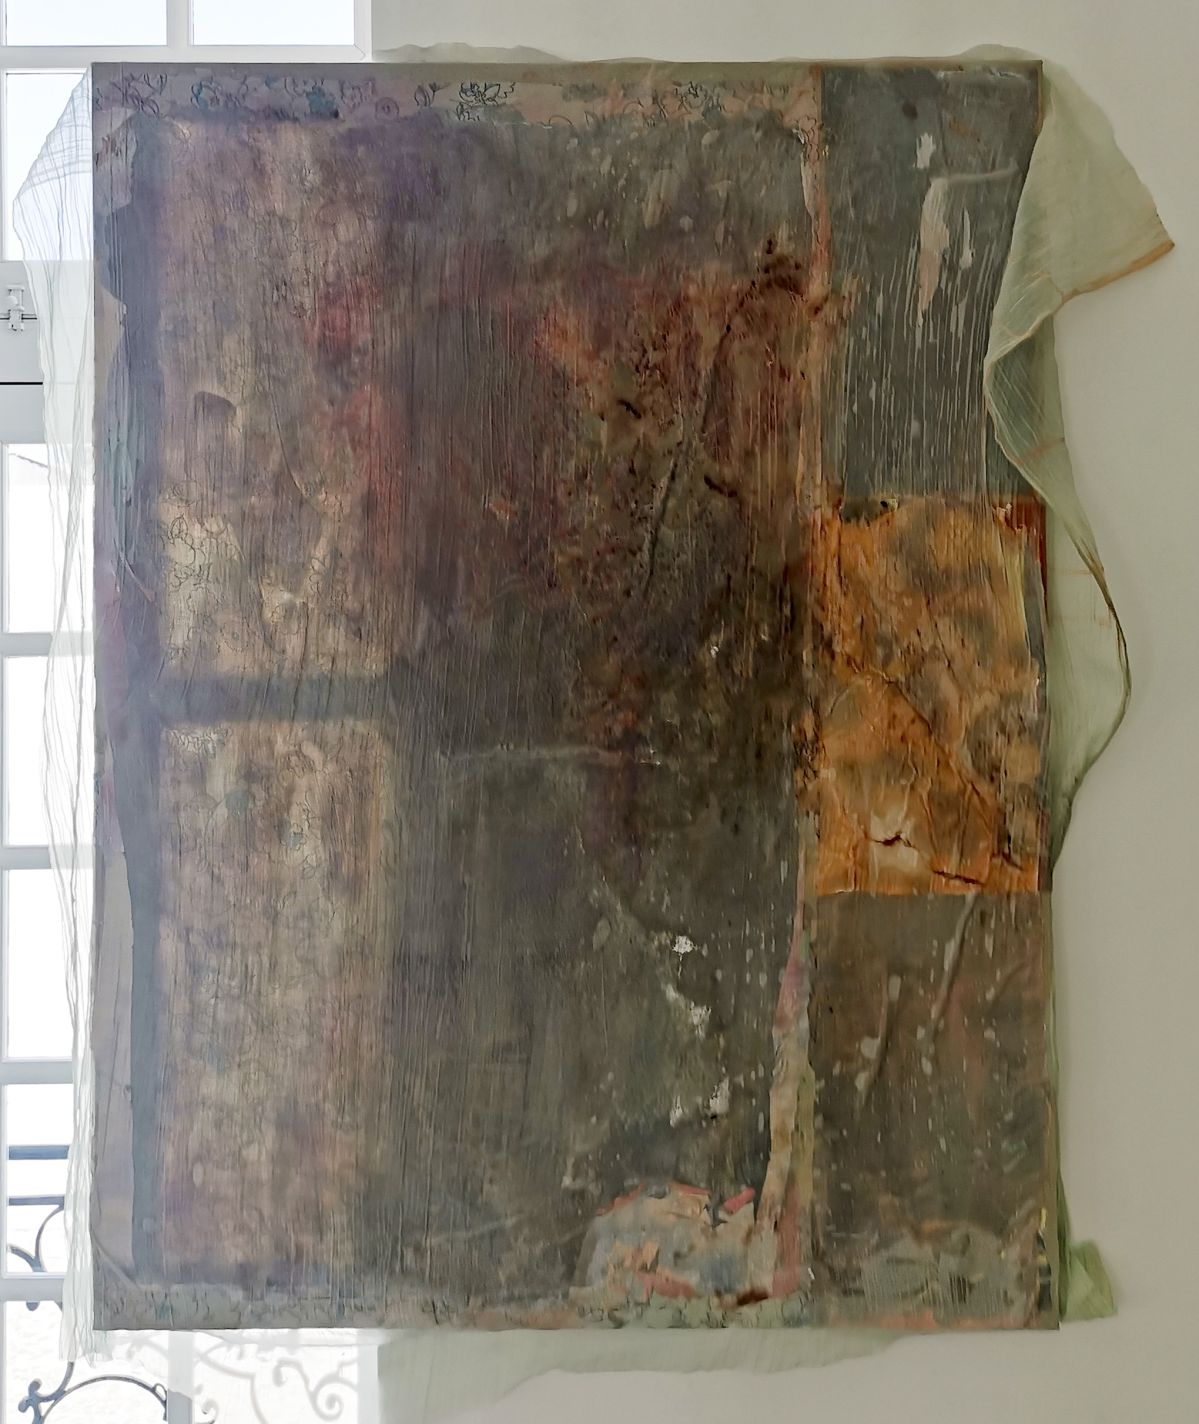 Mimosa Echard - Sluggy me, 2021 - «Sluggy me» à la Collection Lambert - Avignon